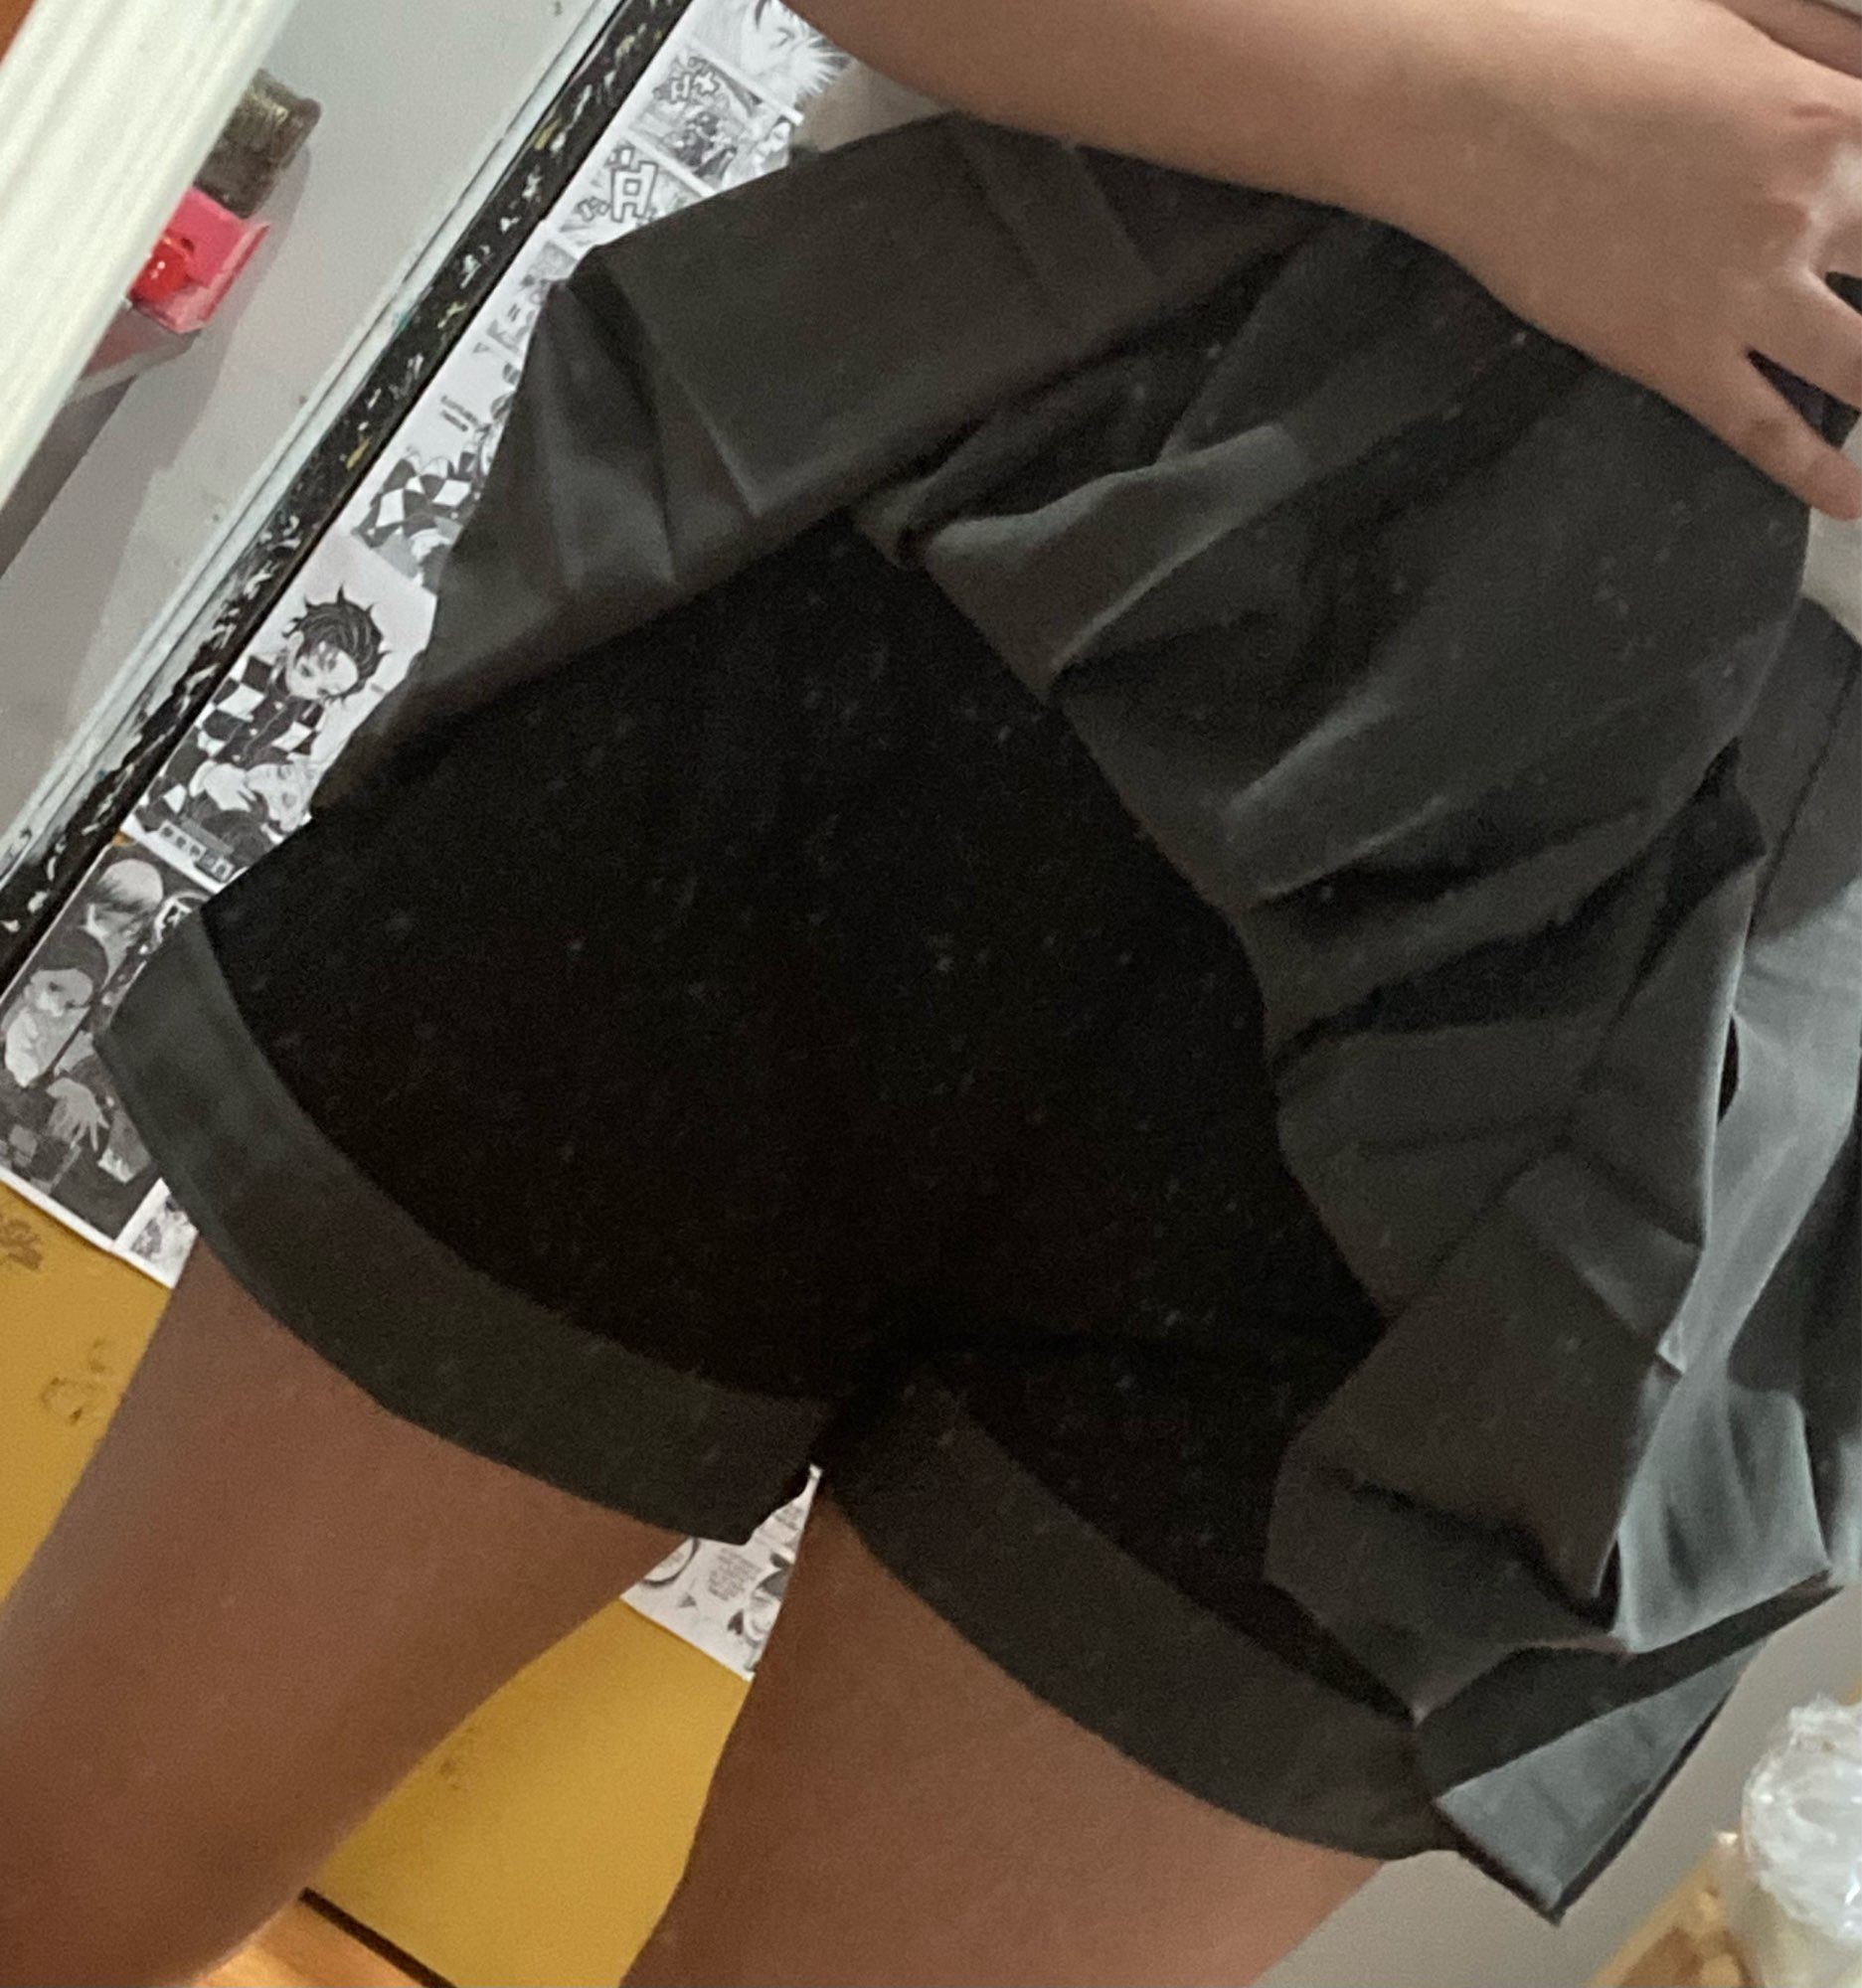 Fashion Women Skirt Preppy Style Plaid Skirts High Waist Chic Student Pleated Skirt Harajuku Uniforms Ladies Girls Dance Skirts Skirts    - AliExpress